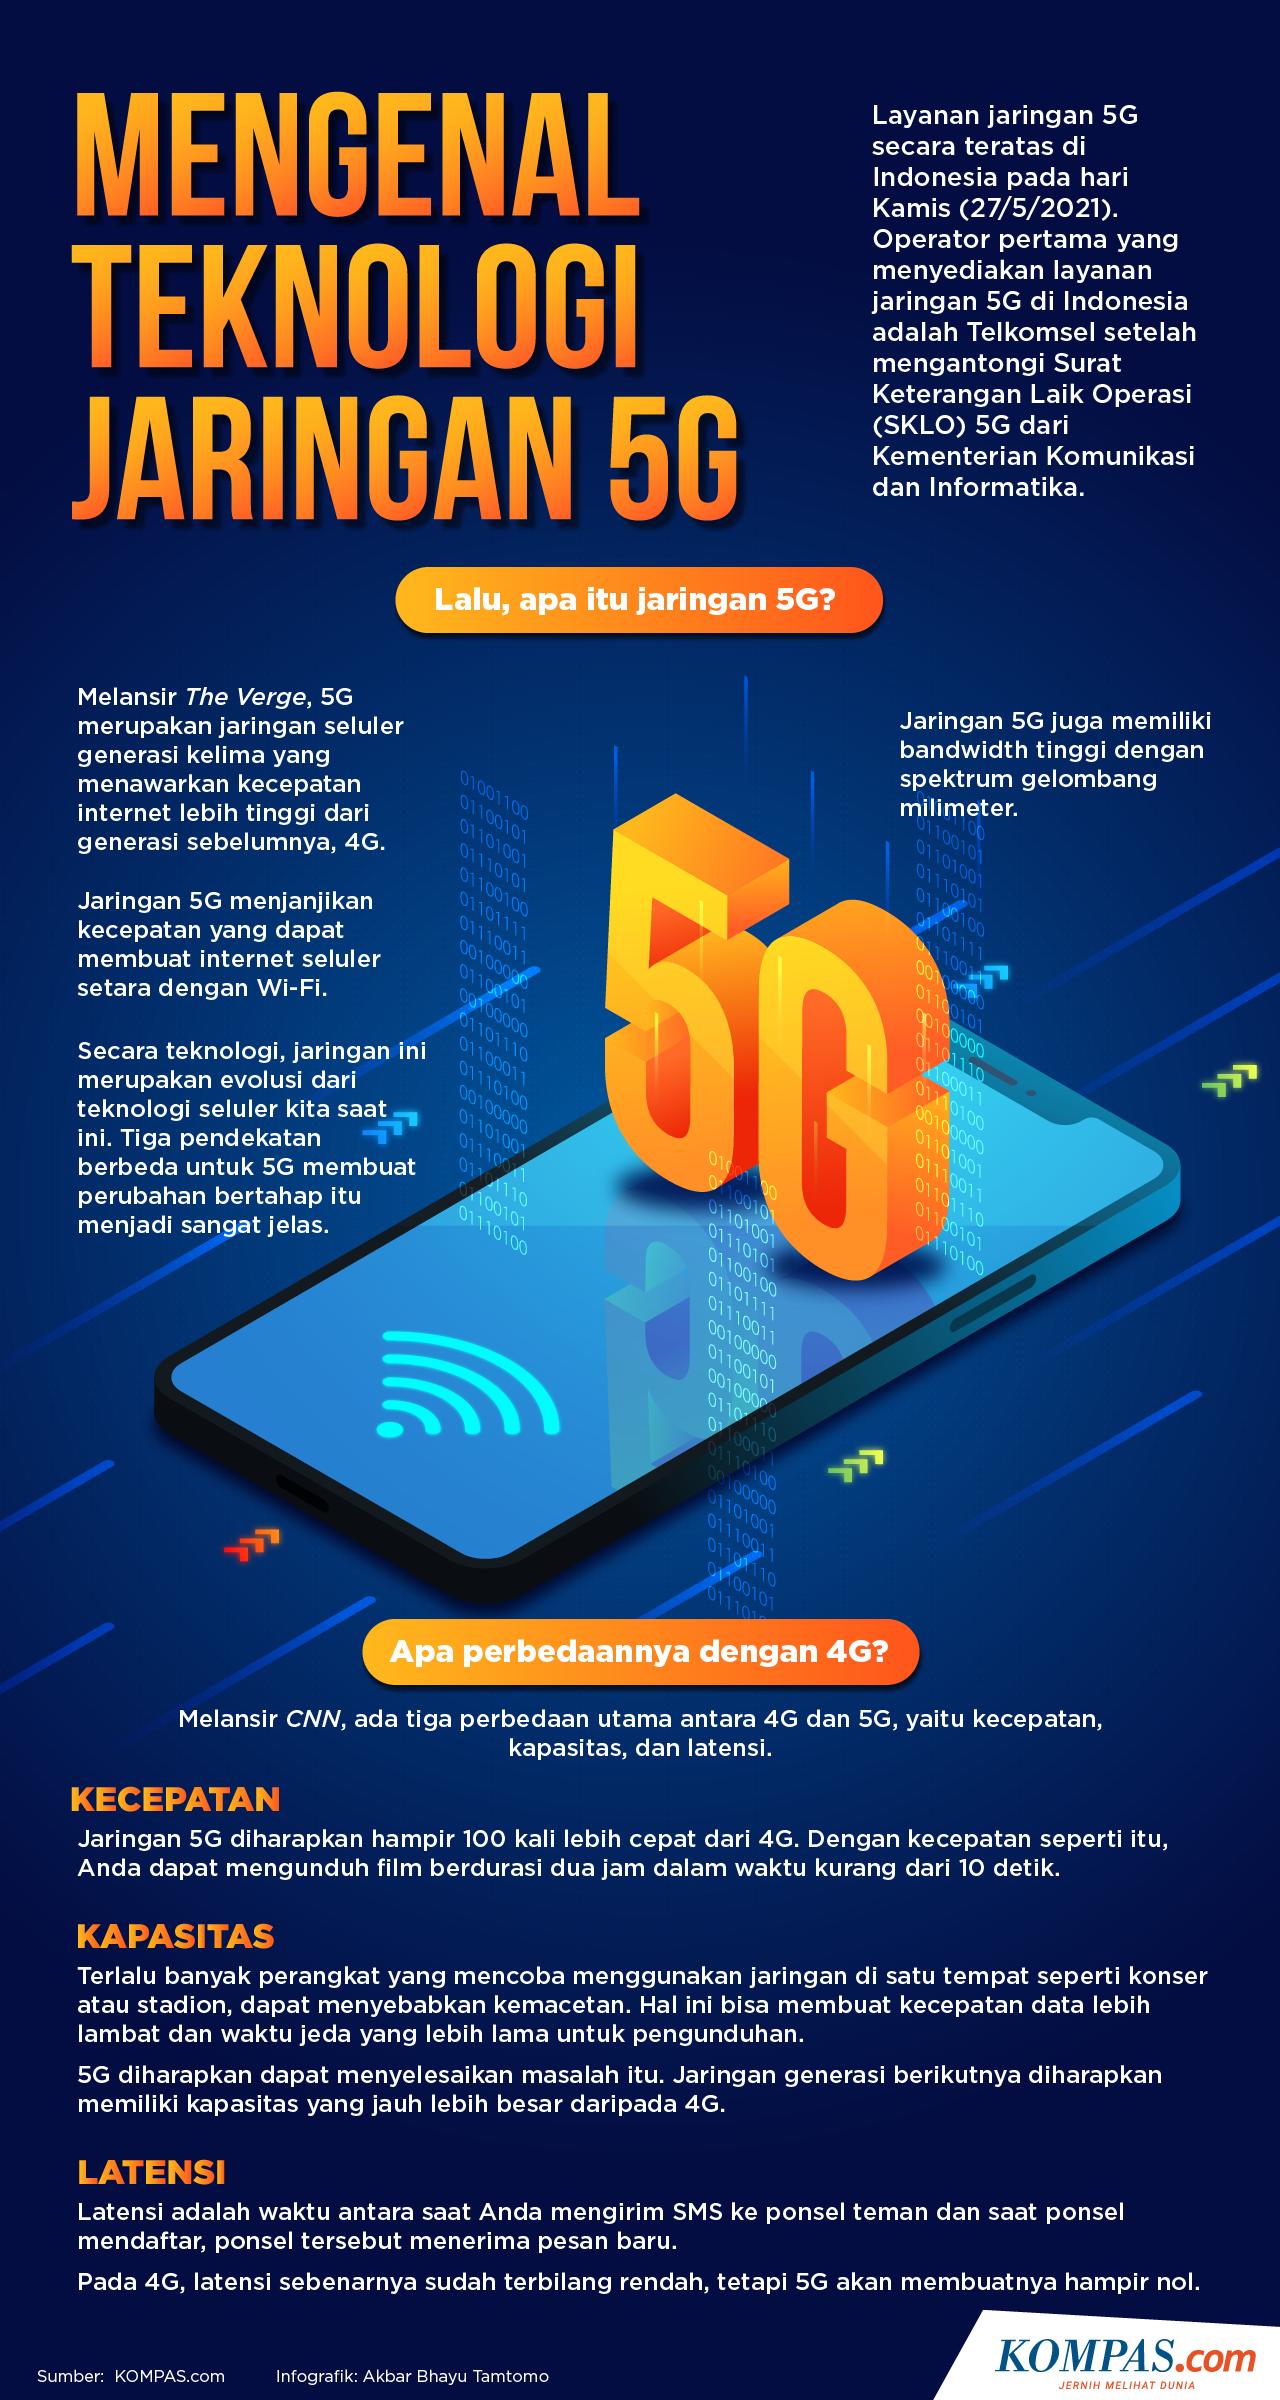 Infografik: Mengenal Teknologi Jaringan 5G.